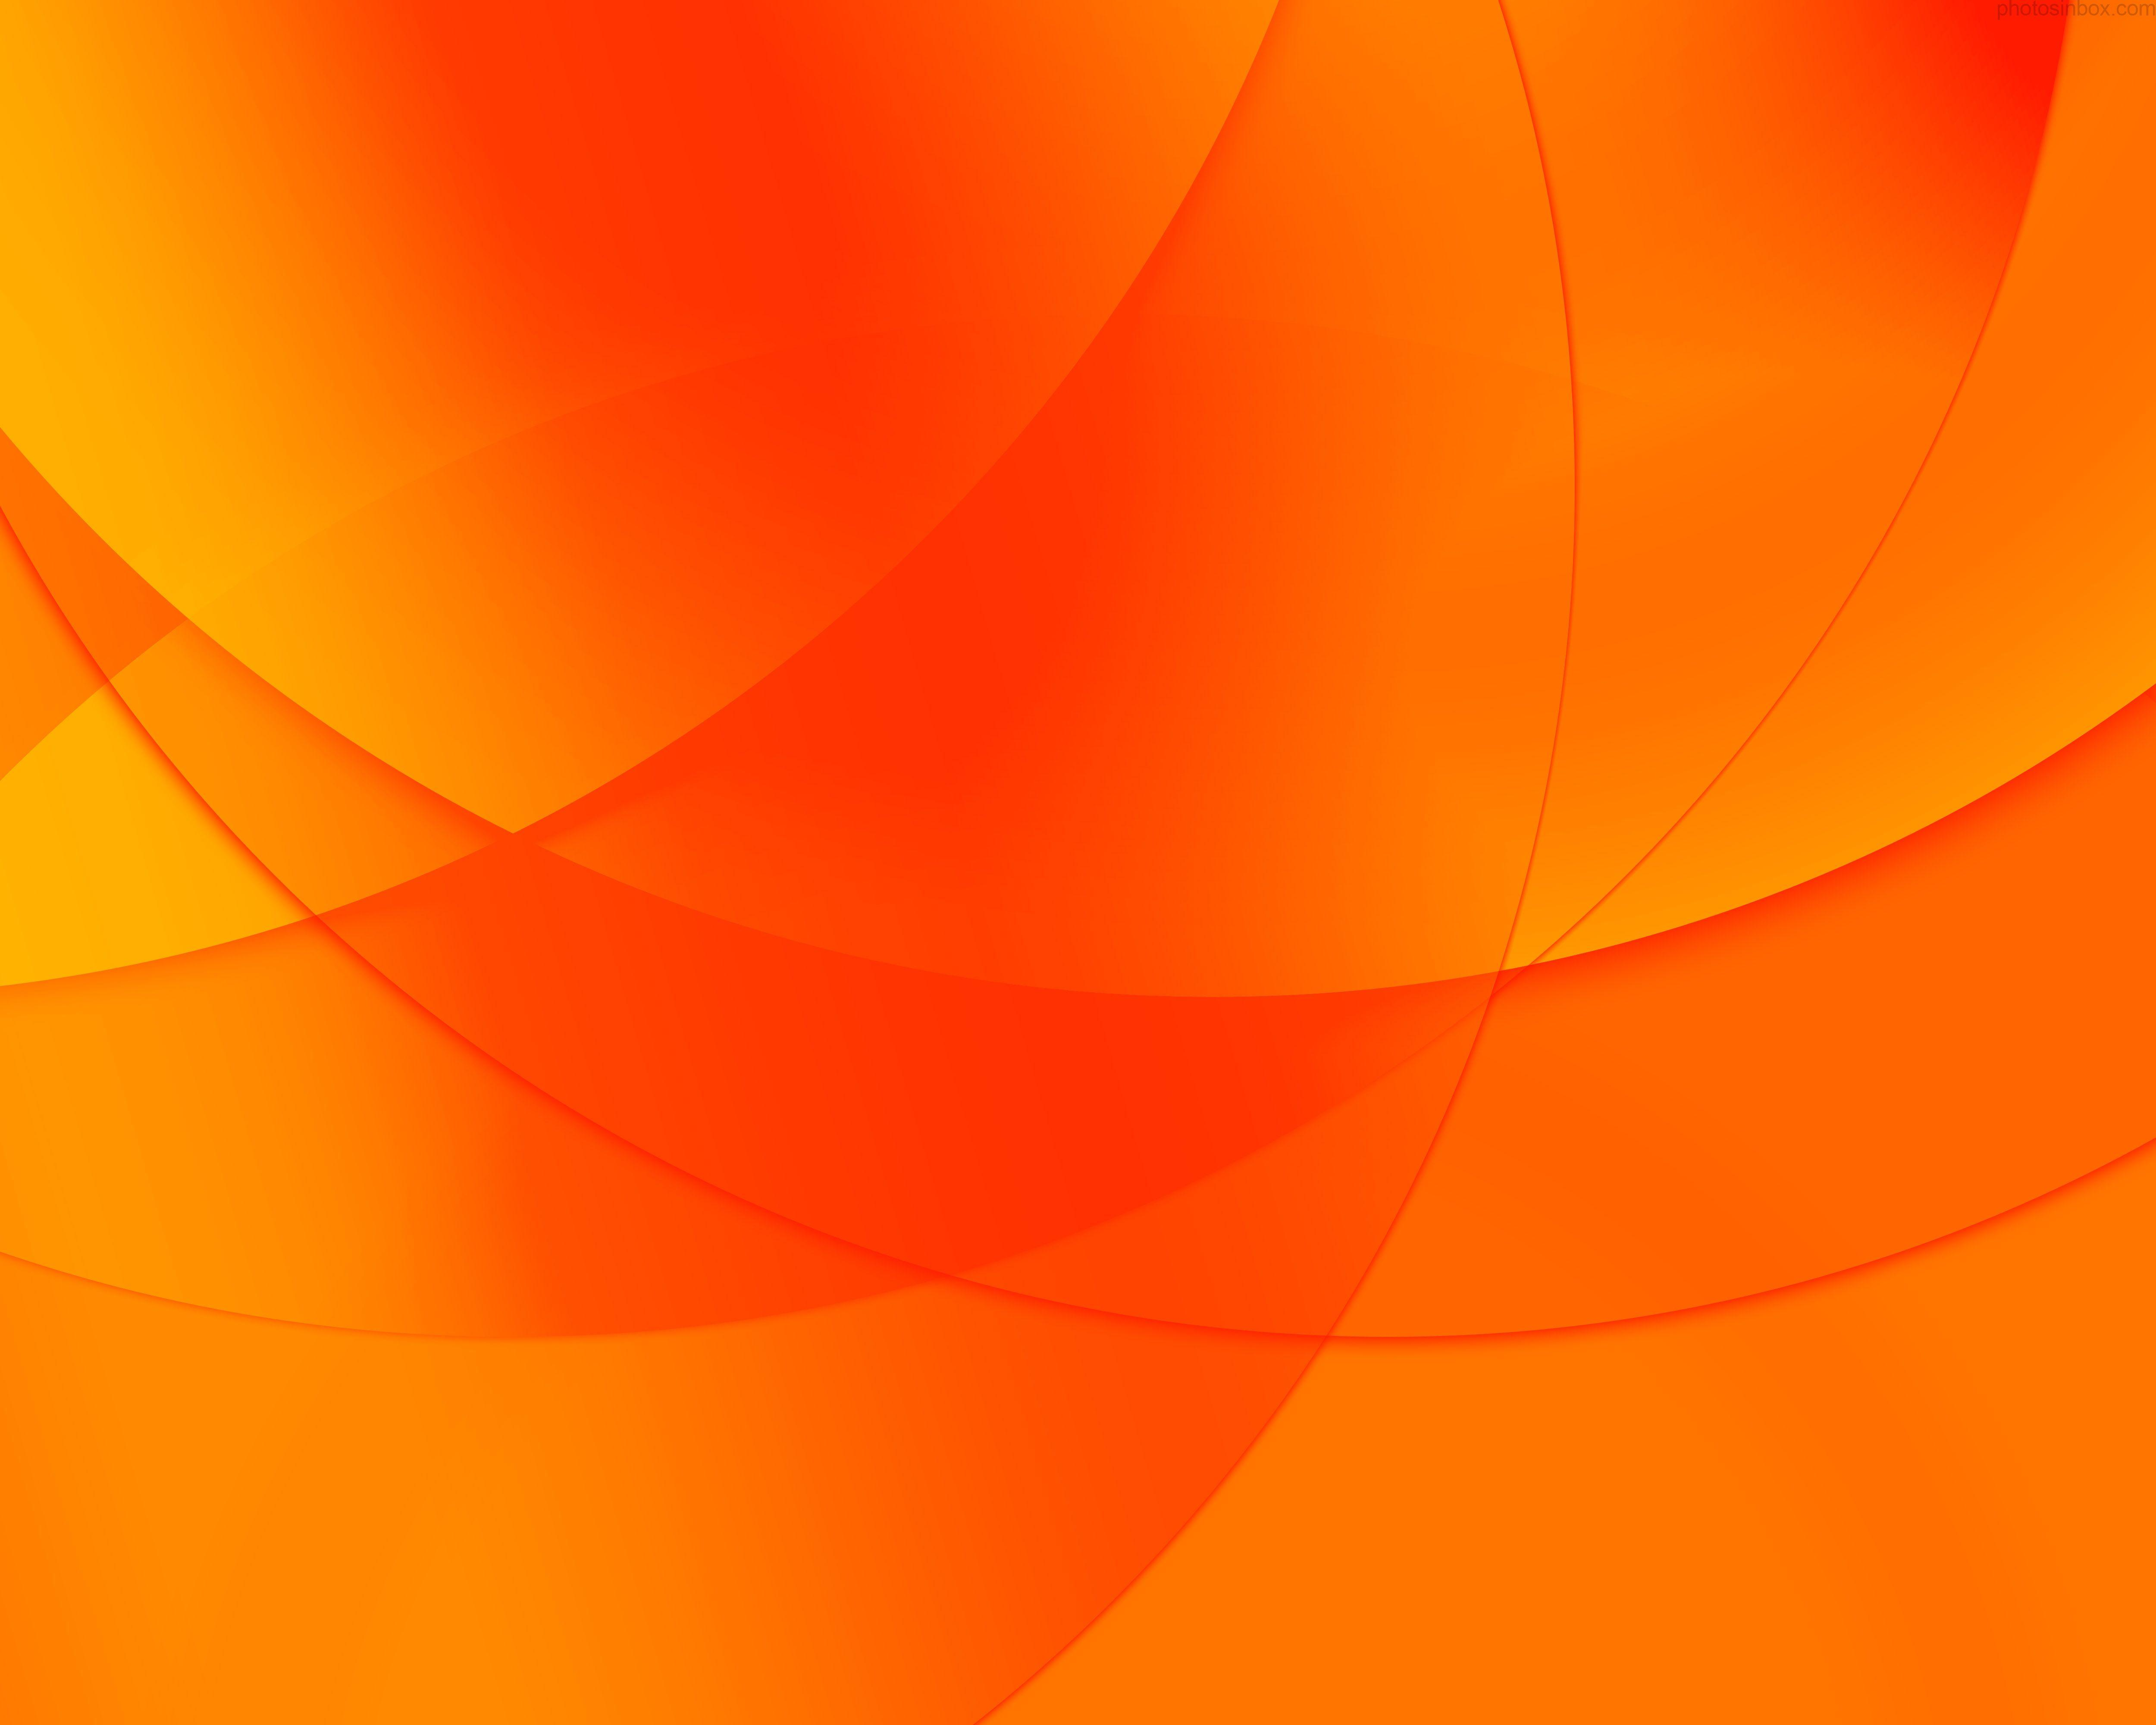 string lights orange hd wallpaper - photo #30